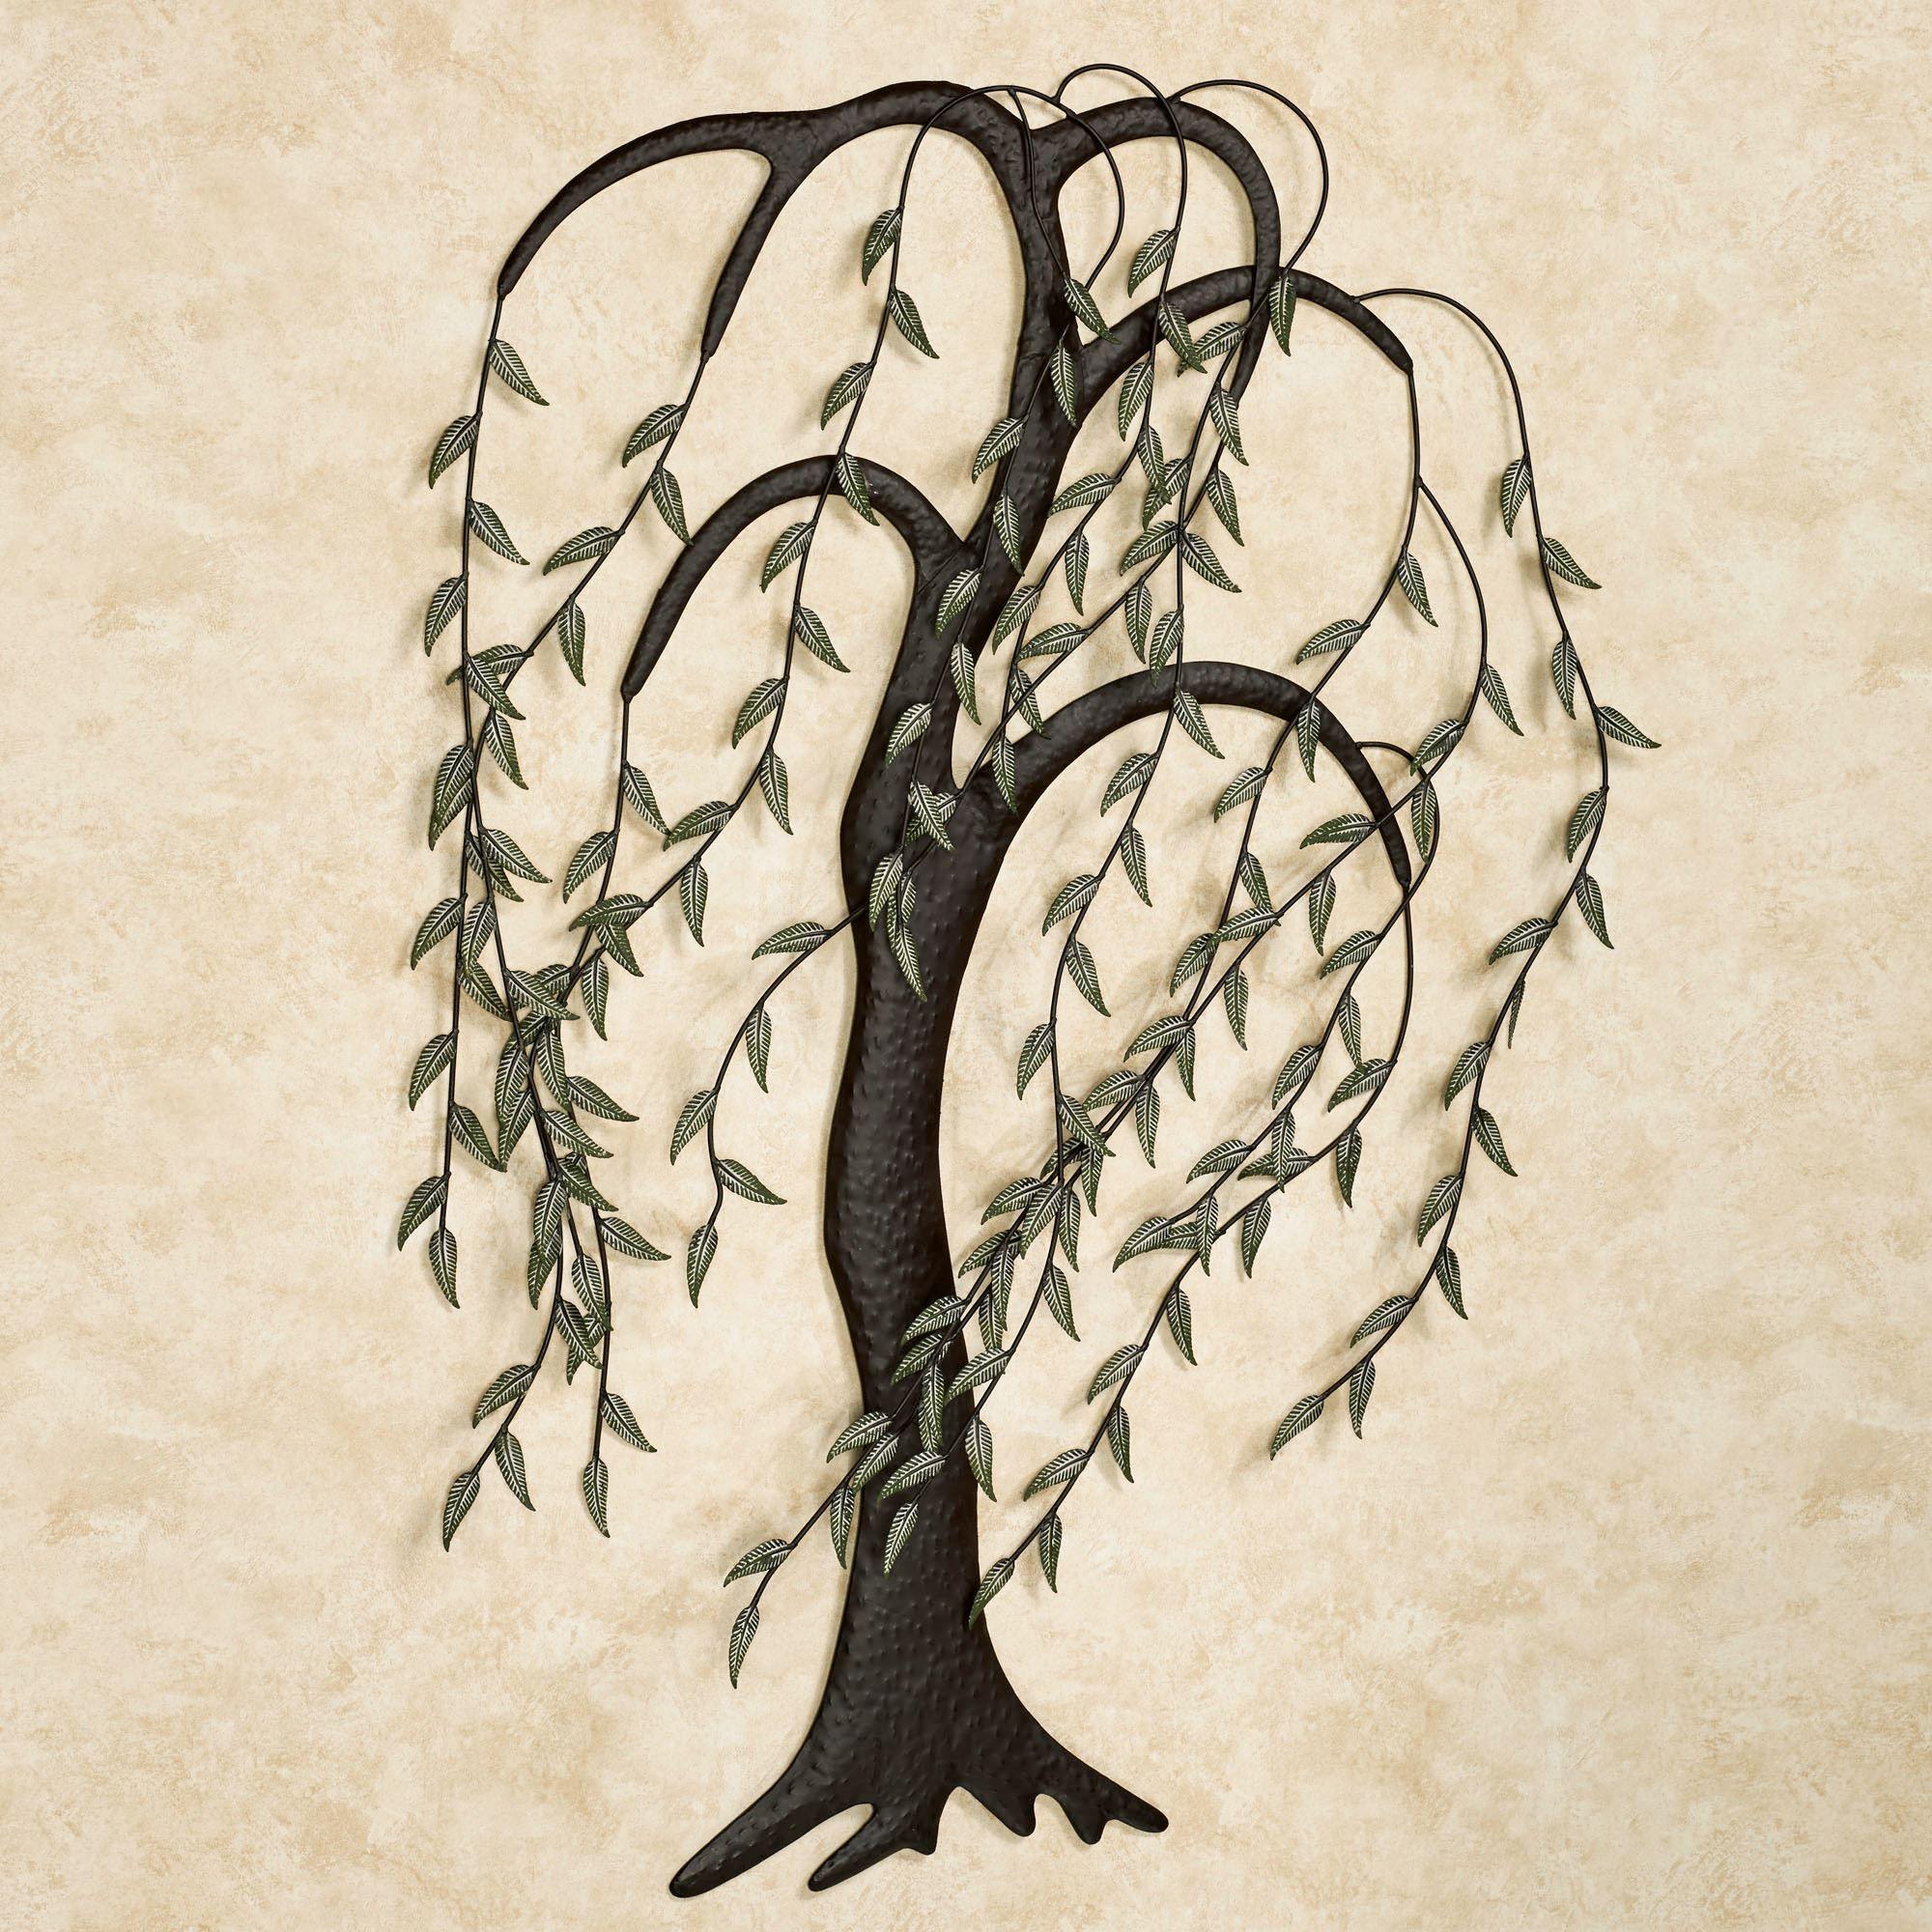 Willow breeze tree metal wall art sculpture willow breeze wall art sculpture brown touch to zoom